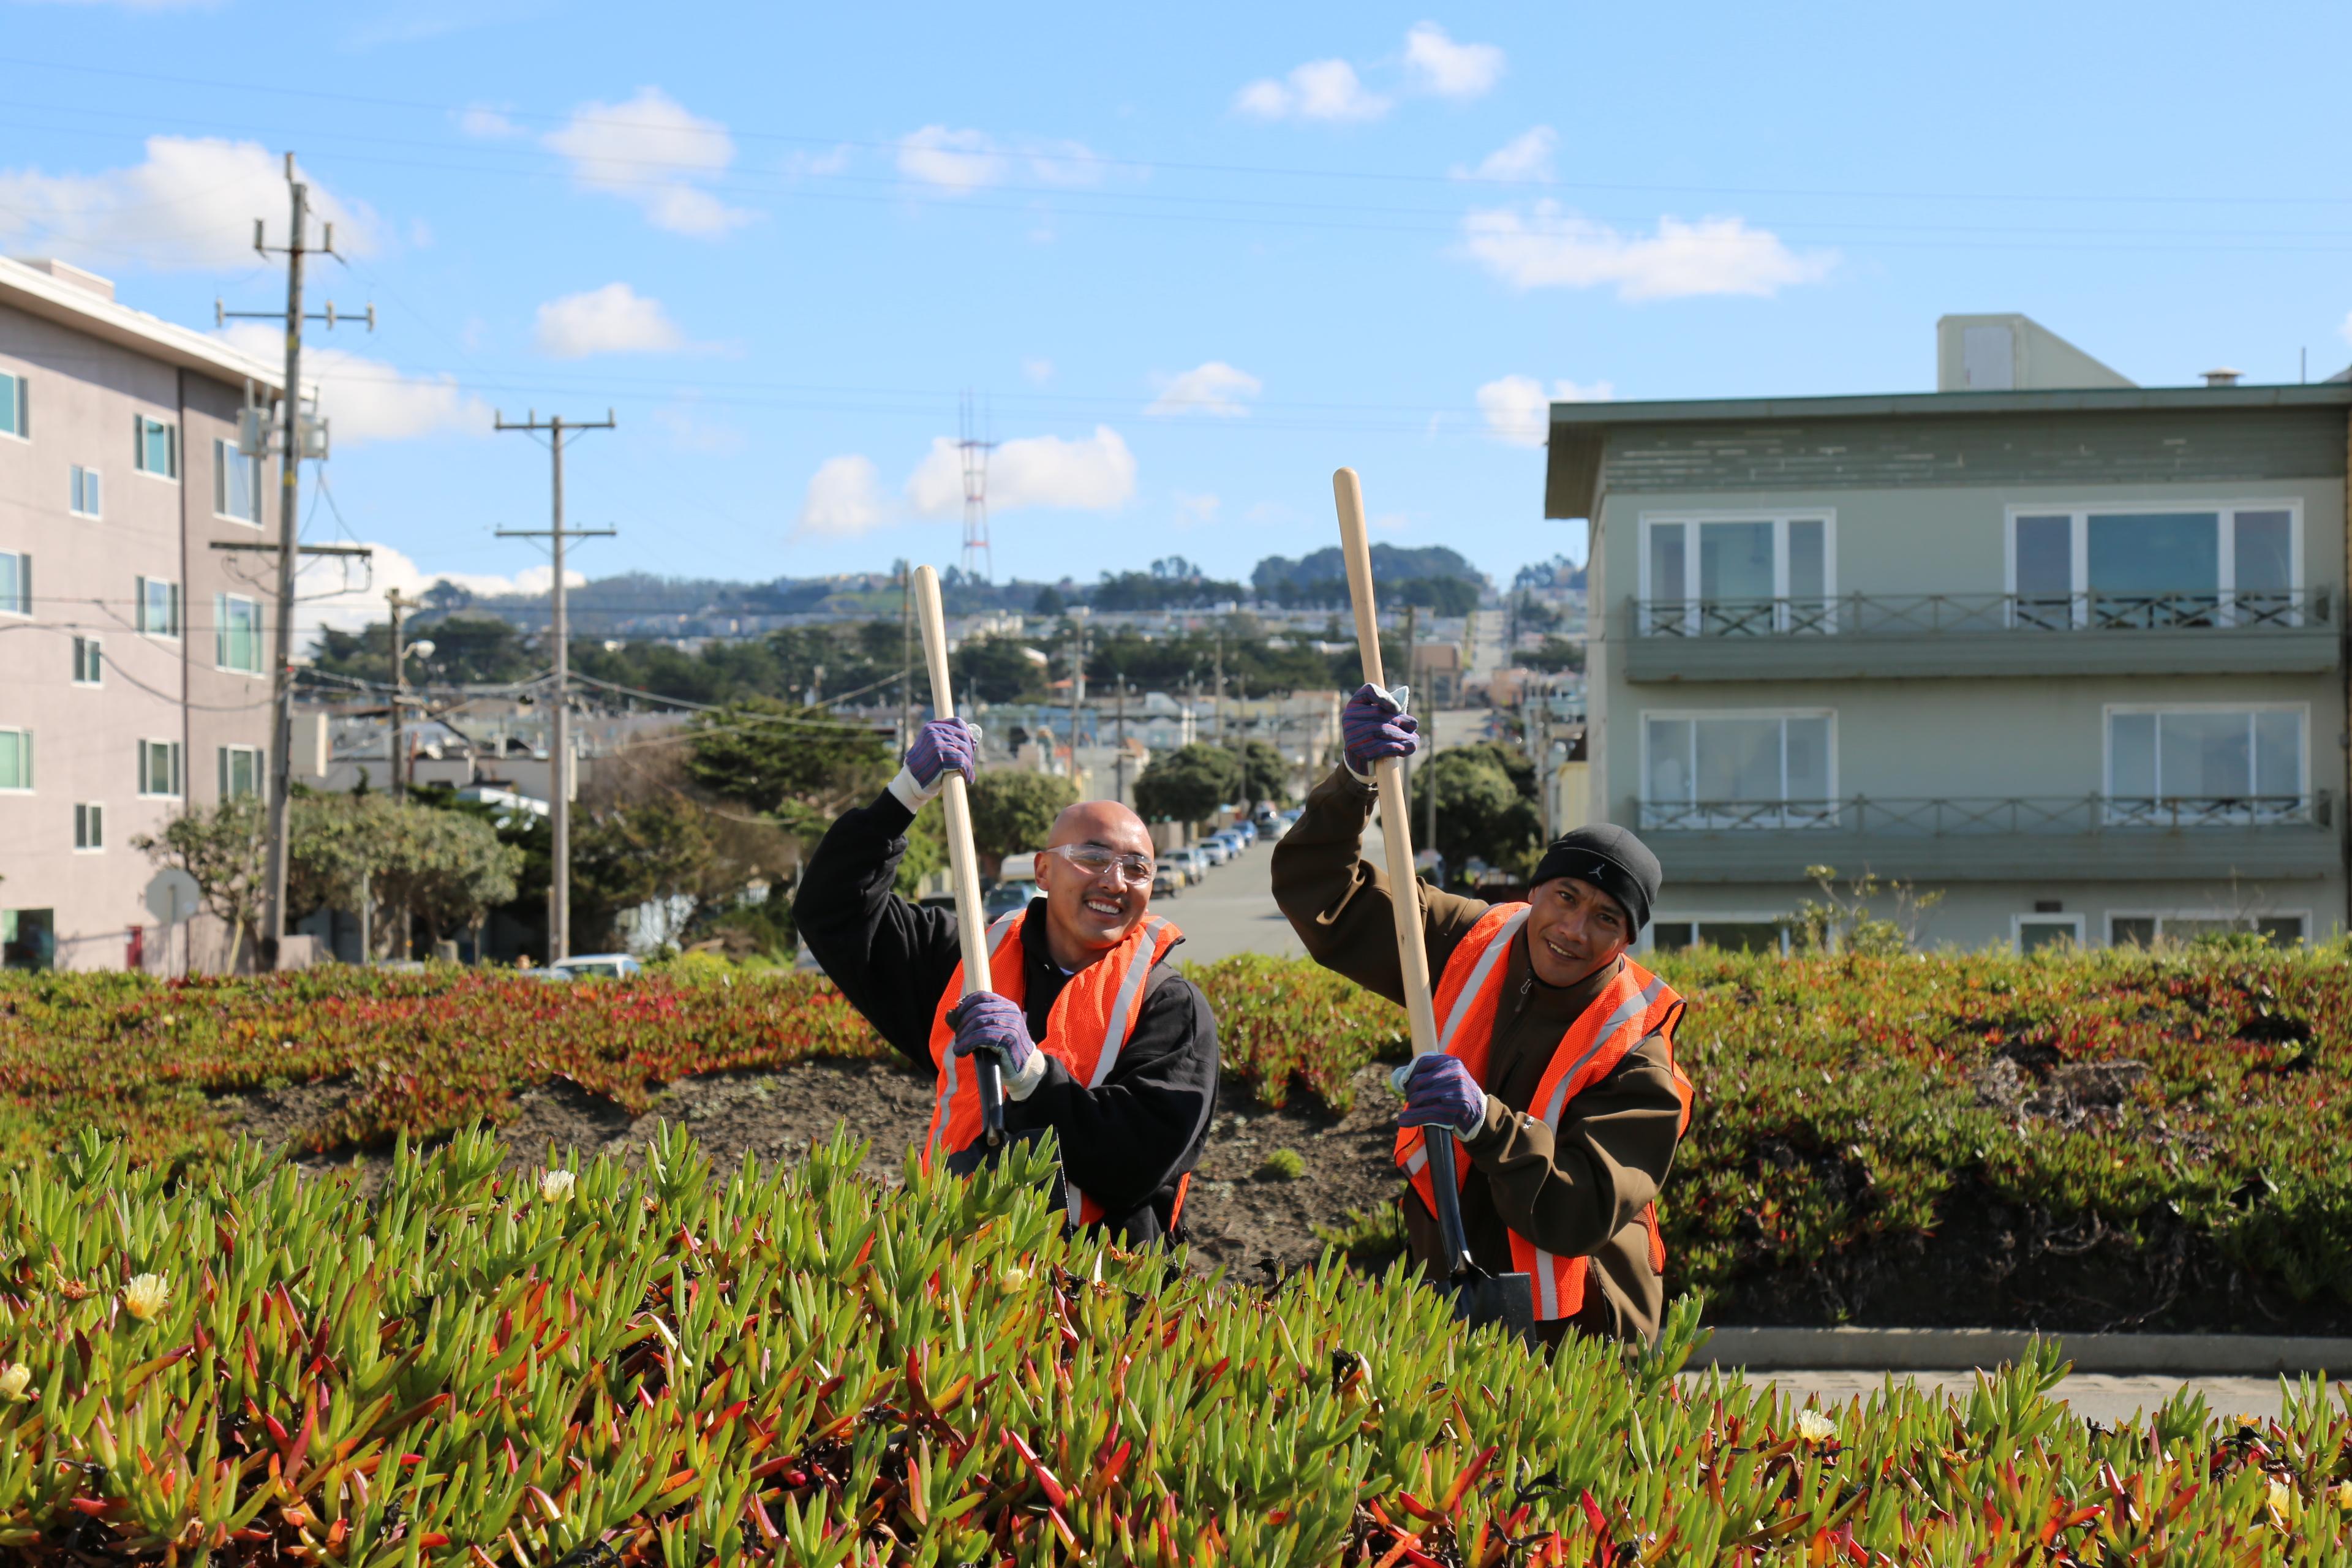 Volunteers landscaping along the Great Highway